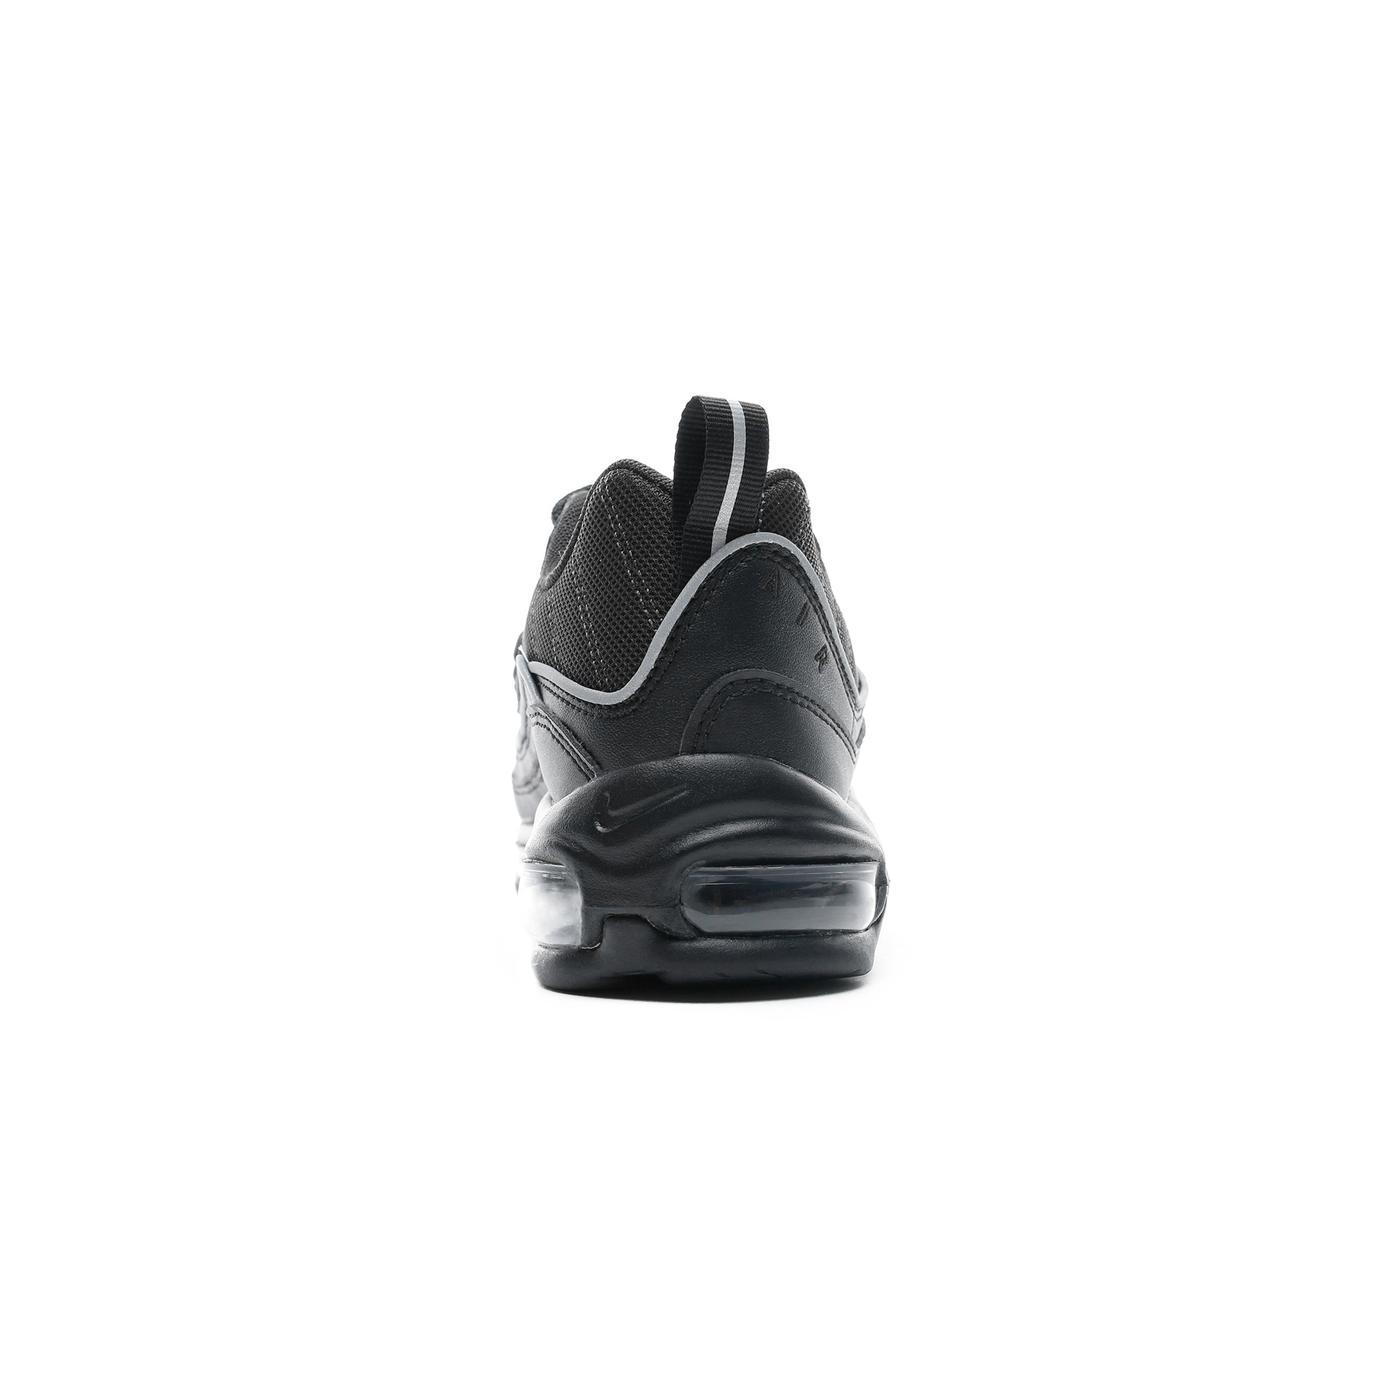 Nike Air Max 98 Siyah Kadın Spor Ayakkabı